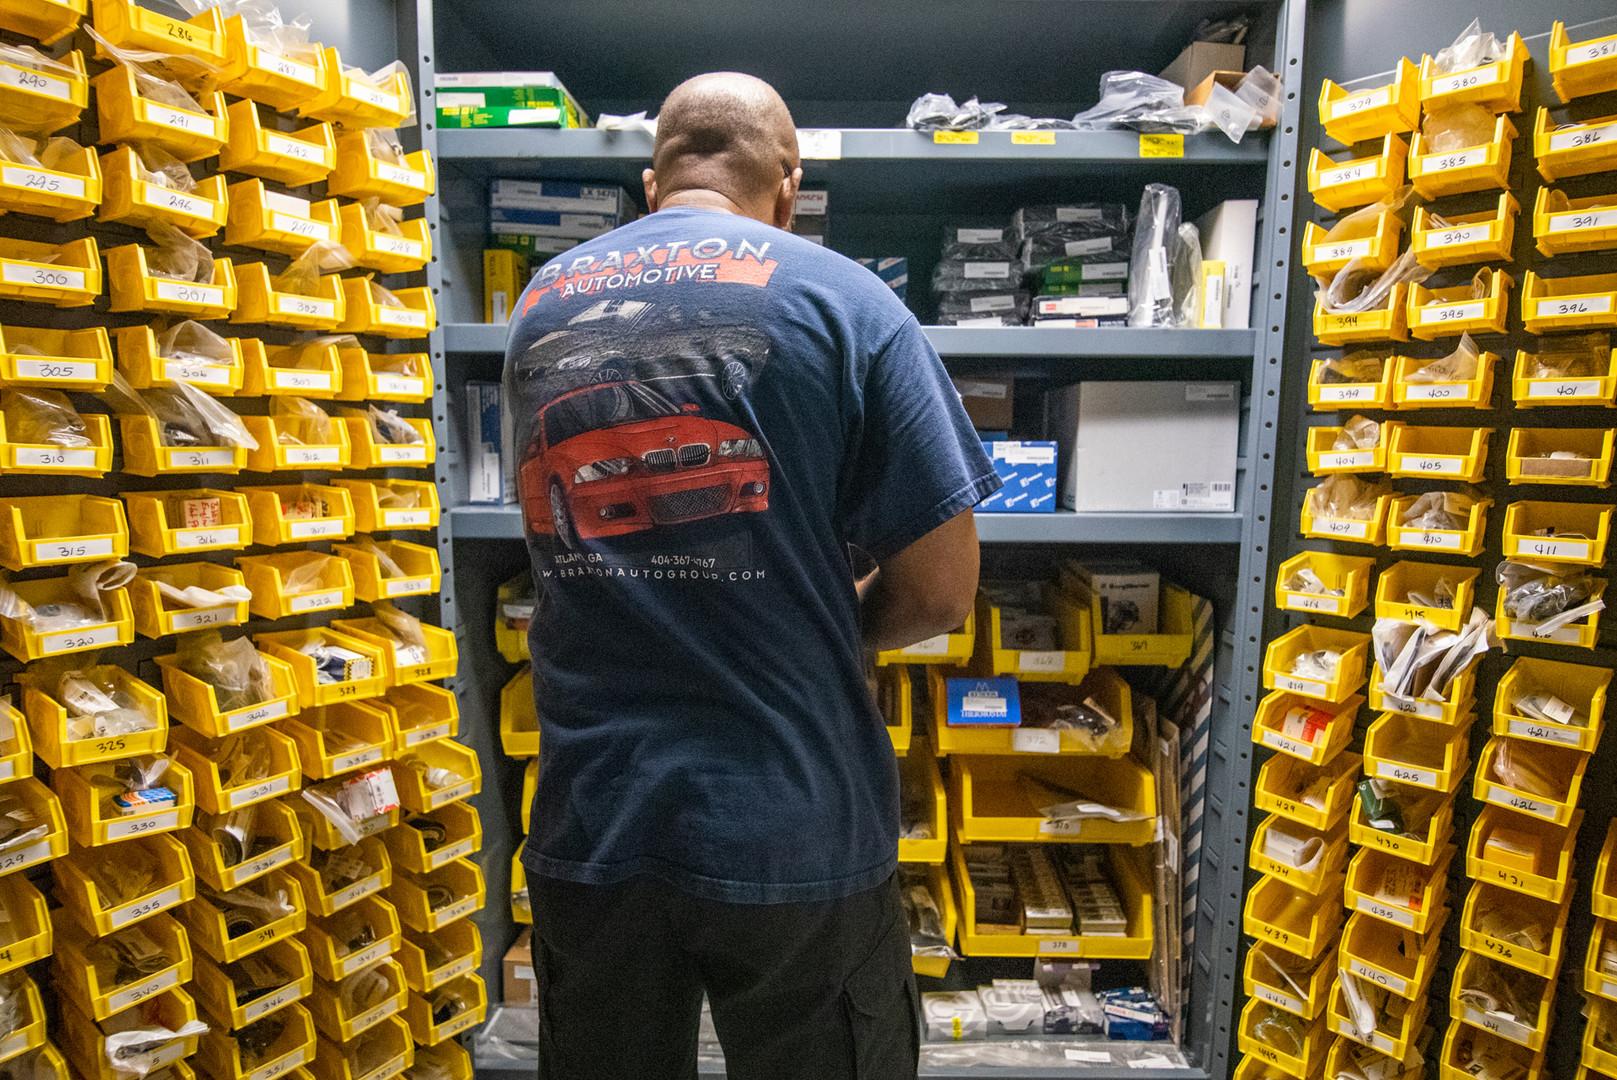 Braxton Tool Closet.jpg